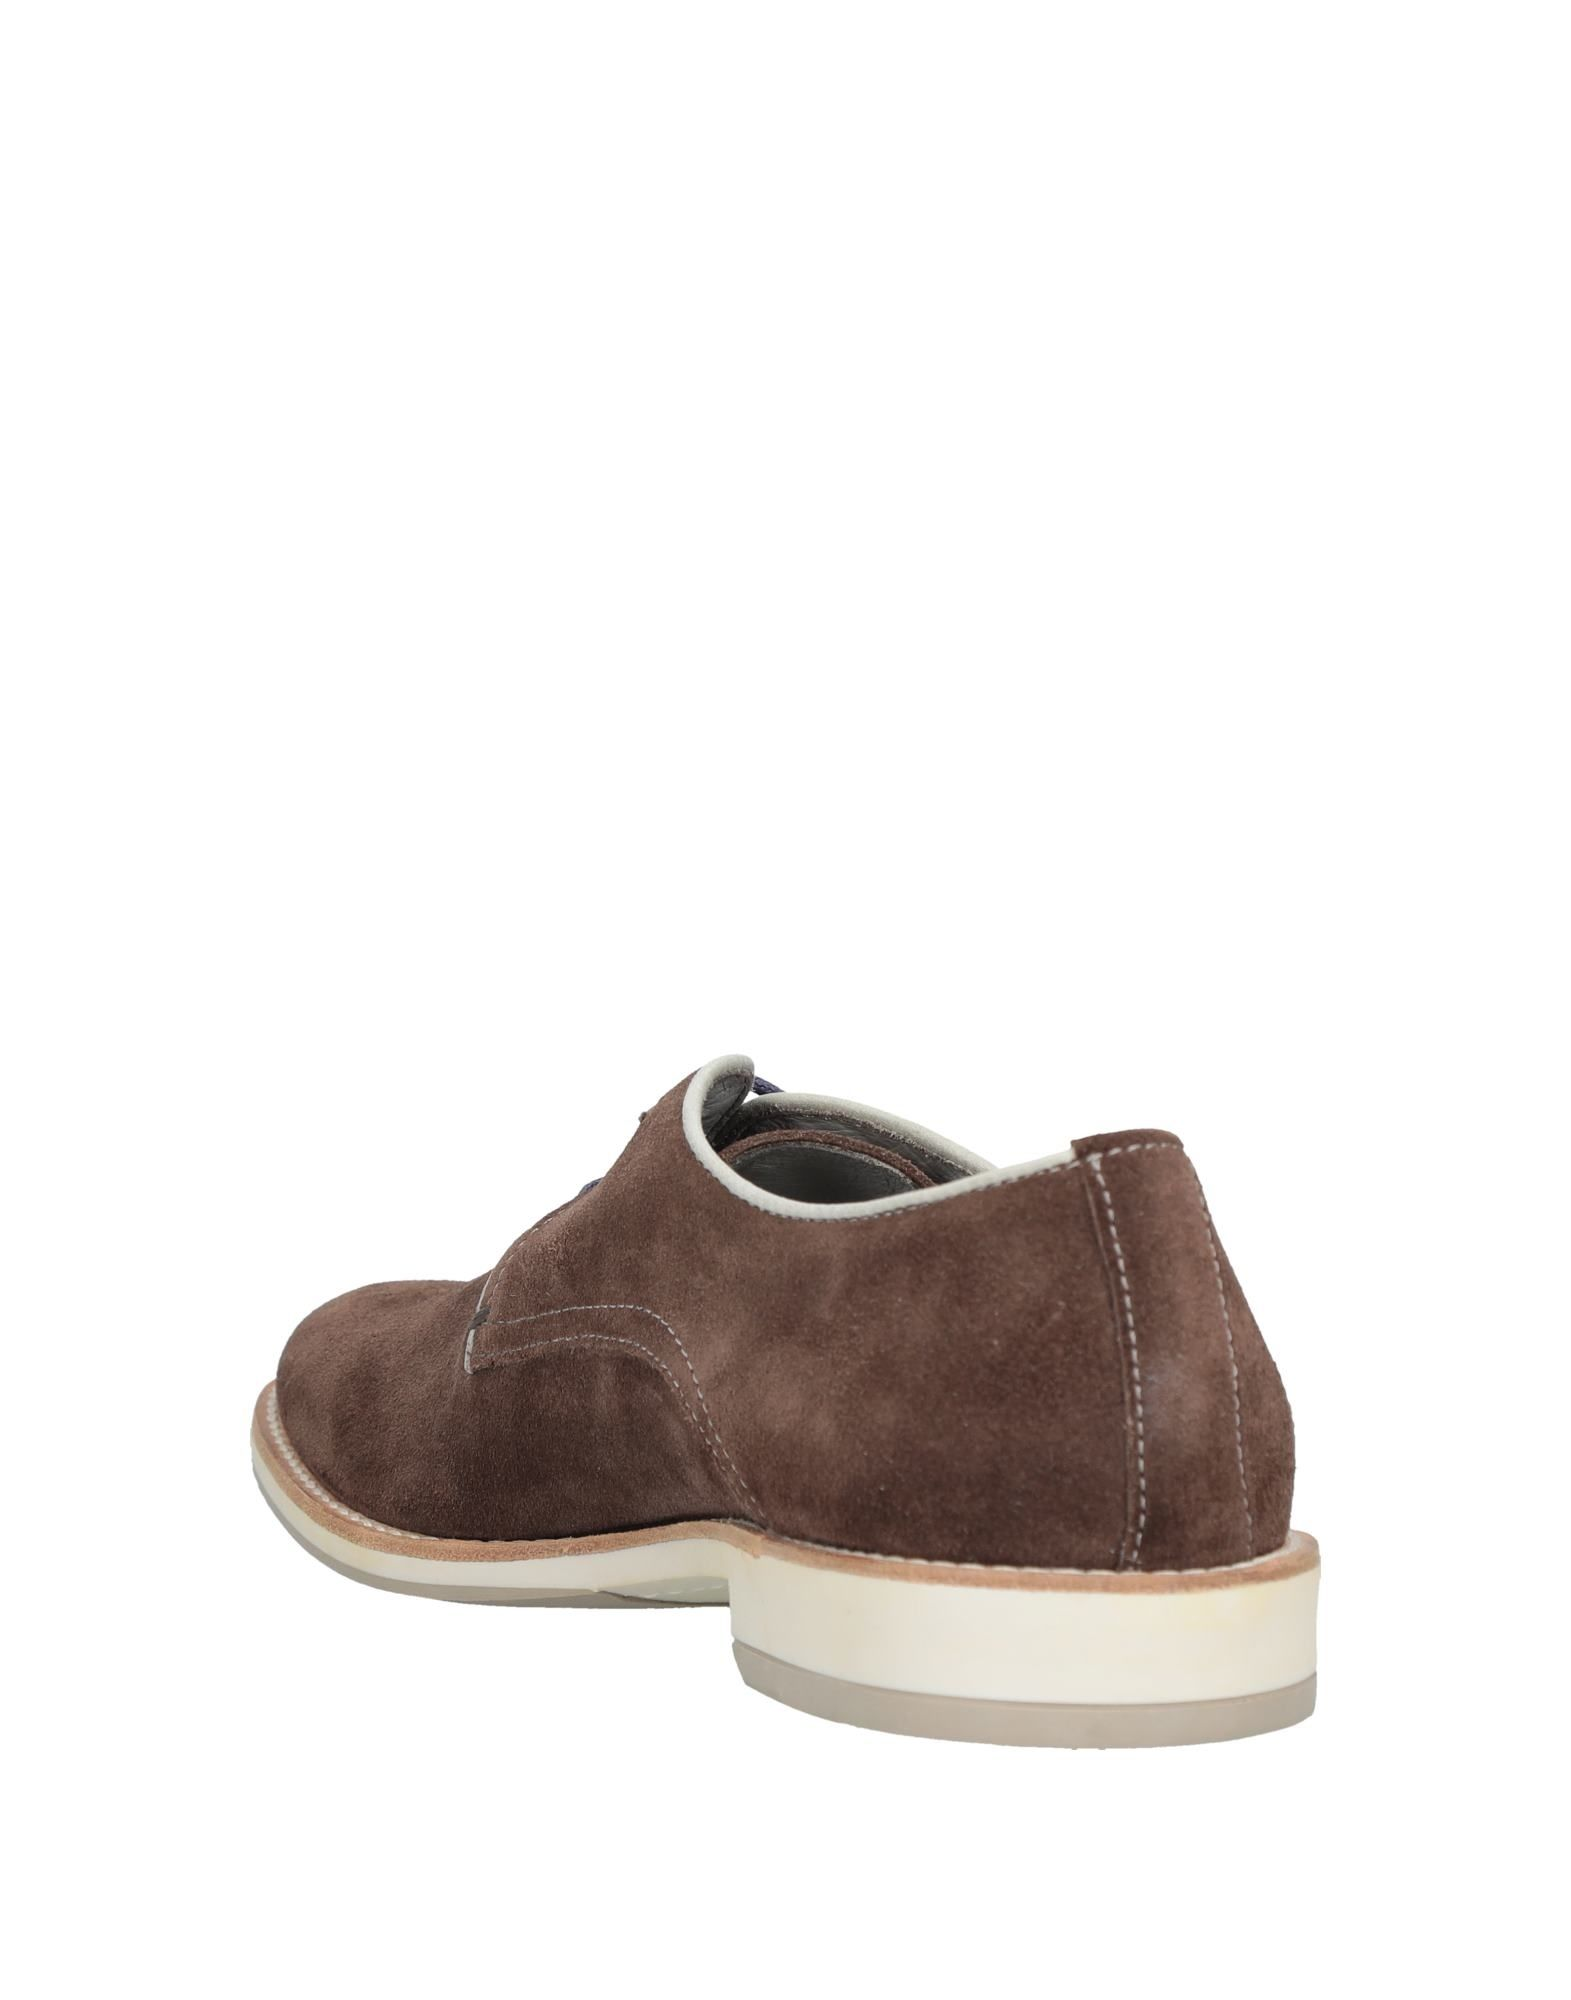 Pal Zileri Gute Schnürschuhe Herren  11526512NC Gute Zileri Qualität beliebte Schuhe f030f1